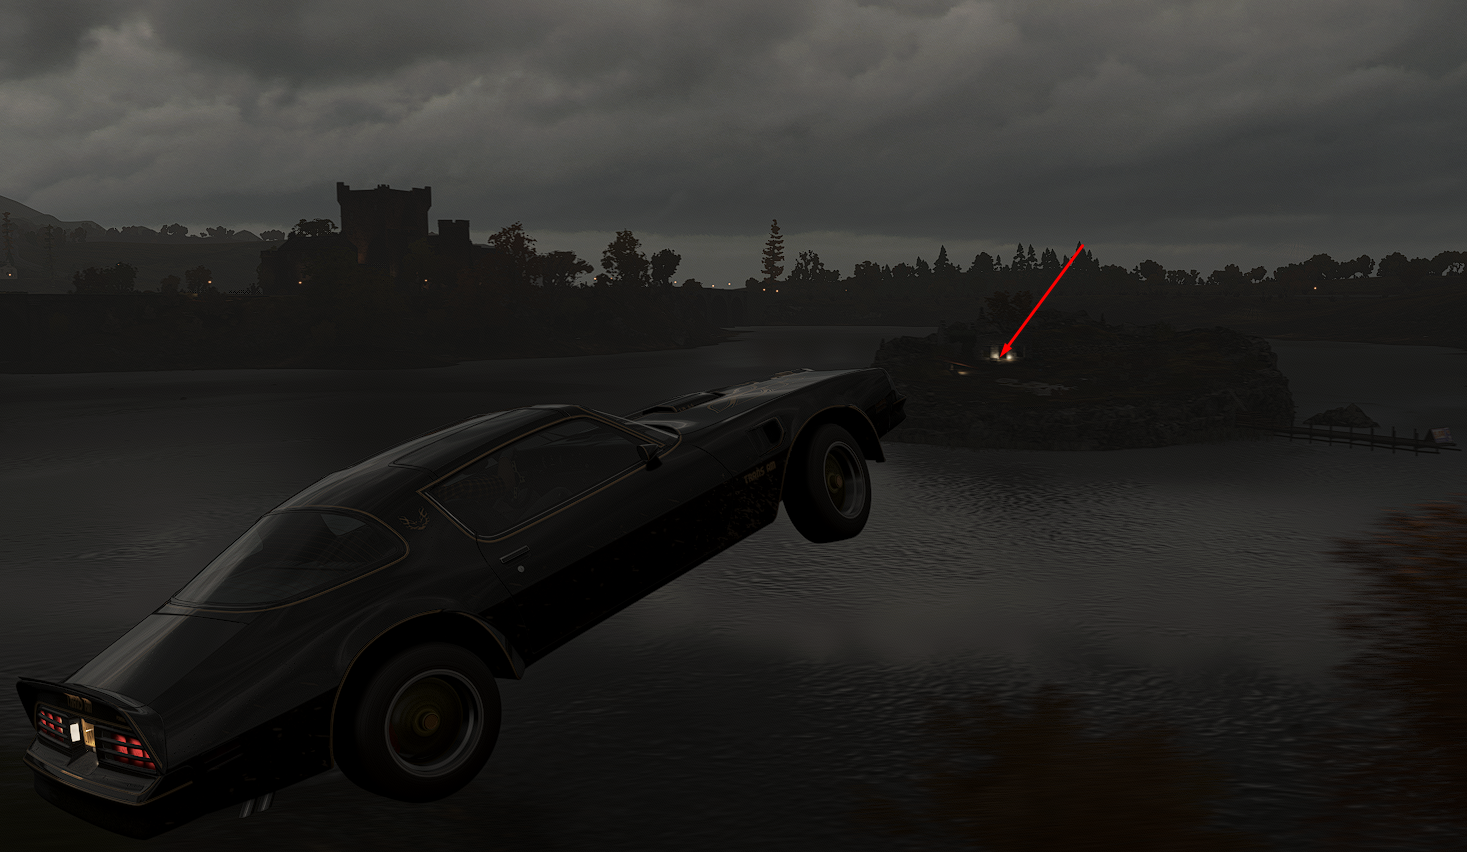 Forza Horizon 4 - All Treasures in Fortune Island Map Location - [10] - Tenth treasure - DDAAC6F